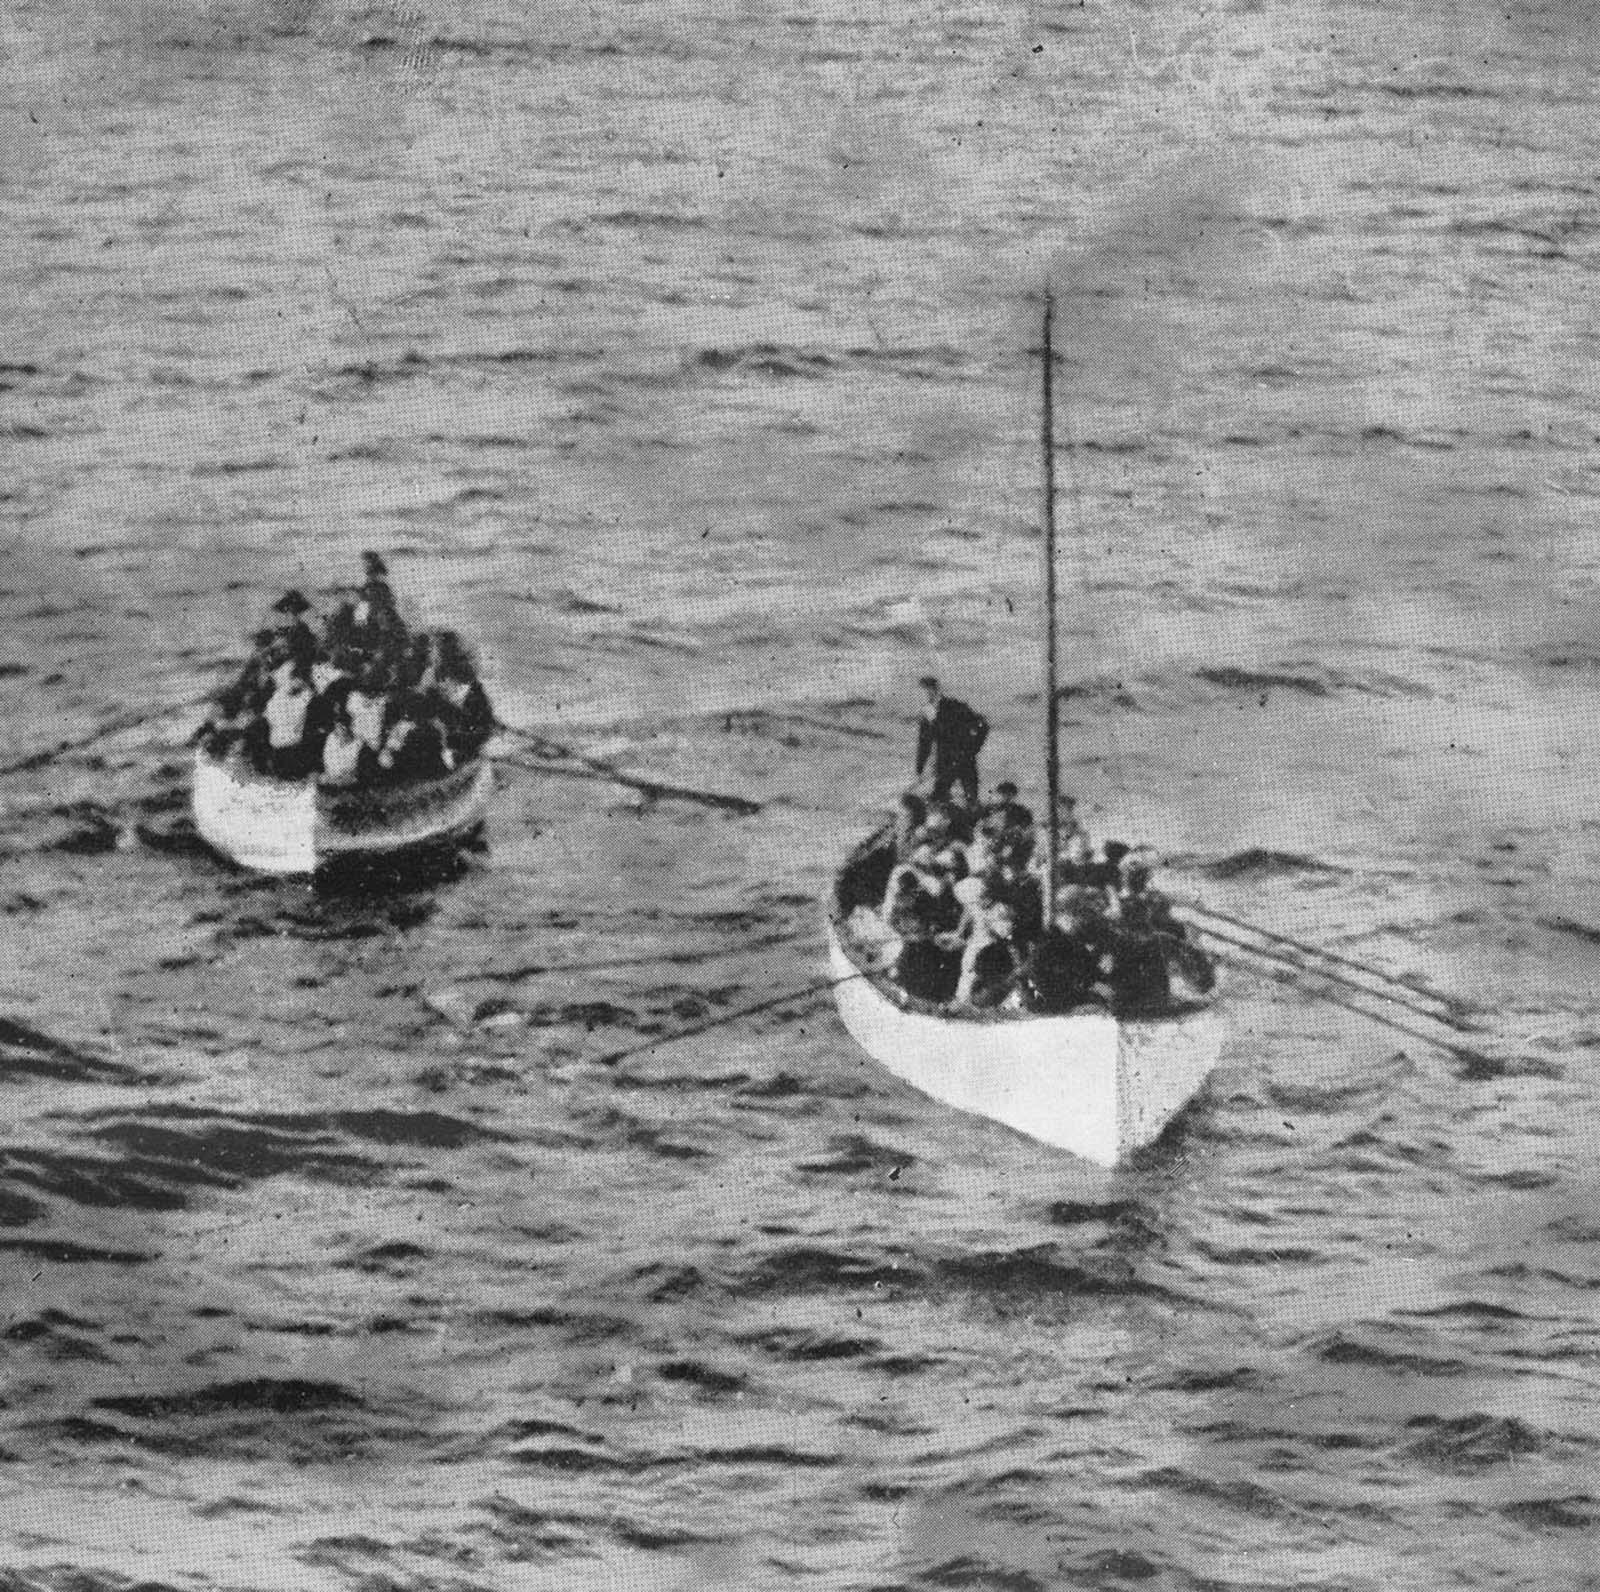 titanic survivors pictures